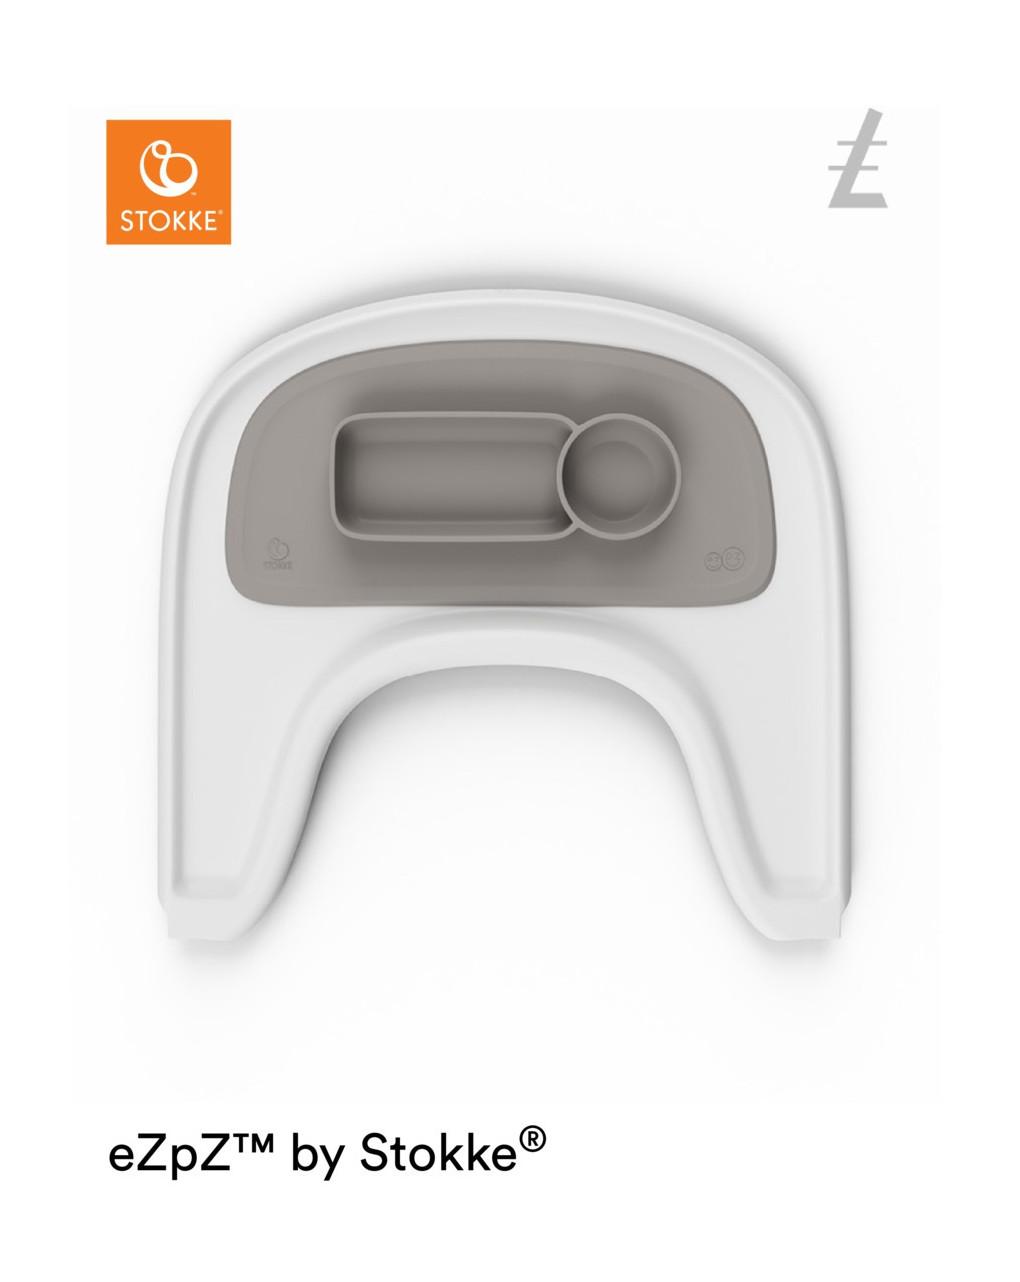 Ezpz™ by stokke™ tovaglietta per vassoio stokke®  - soft grey - Stokke